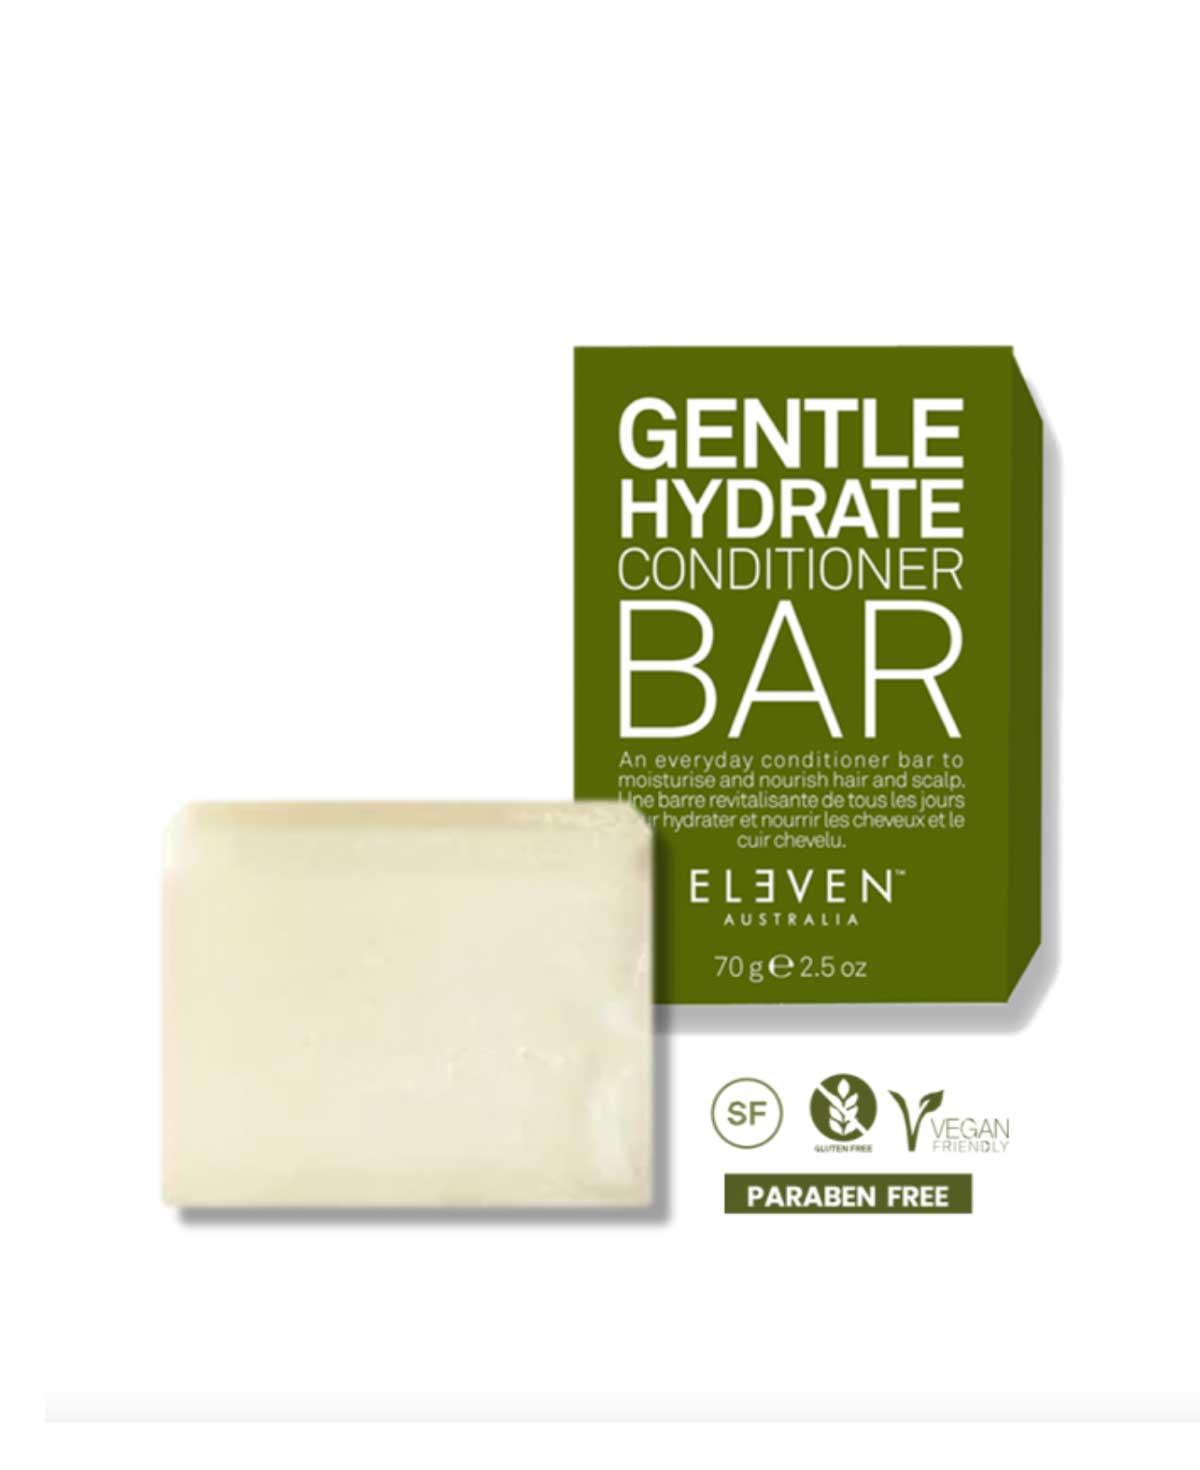 Eleven Gentle Hydrate Conditioner Bar 70g